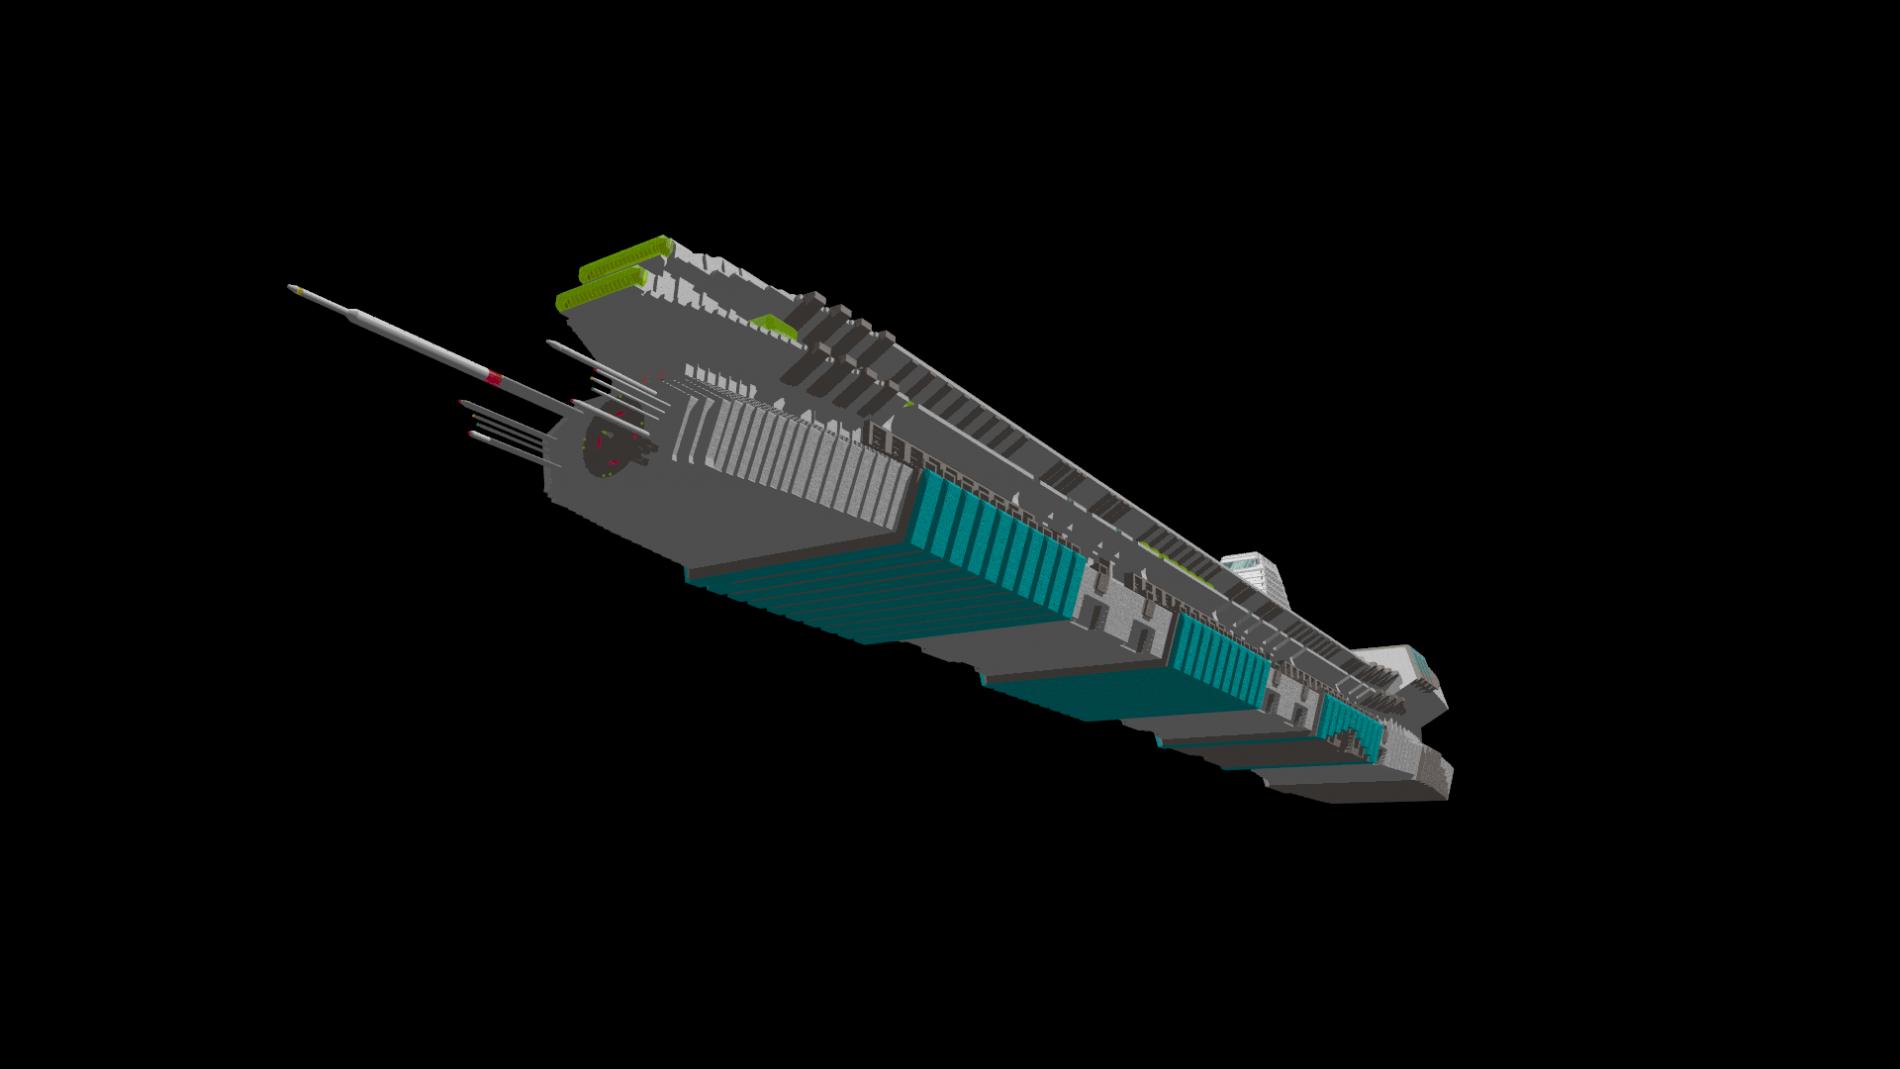 L.M.S. Explorer HD render 5